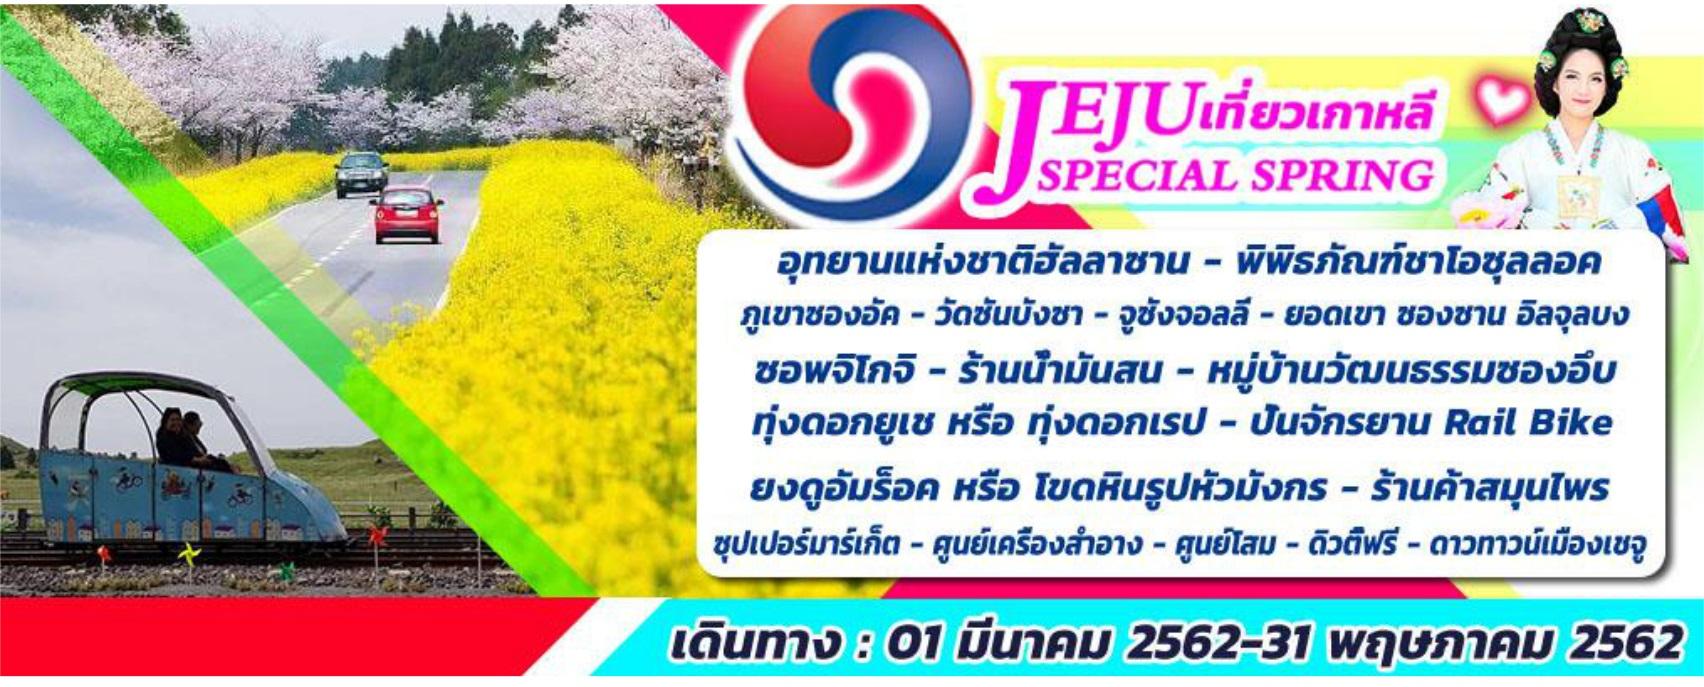 JEJU SPECIAL SPRING 4D2N ทัวร์เกาหลี เกาะเชจู